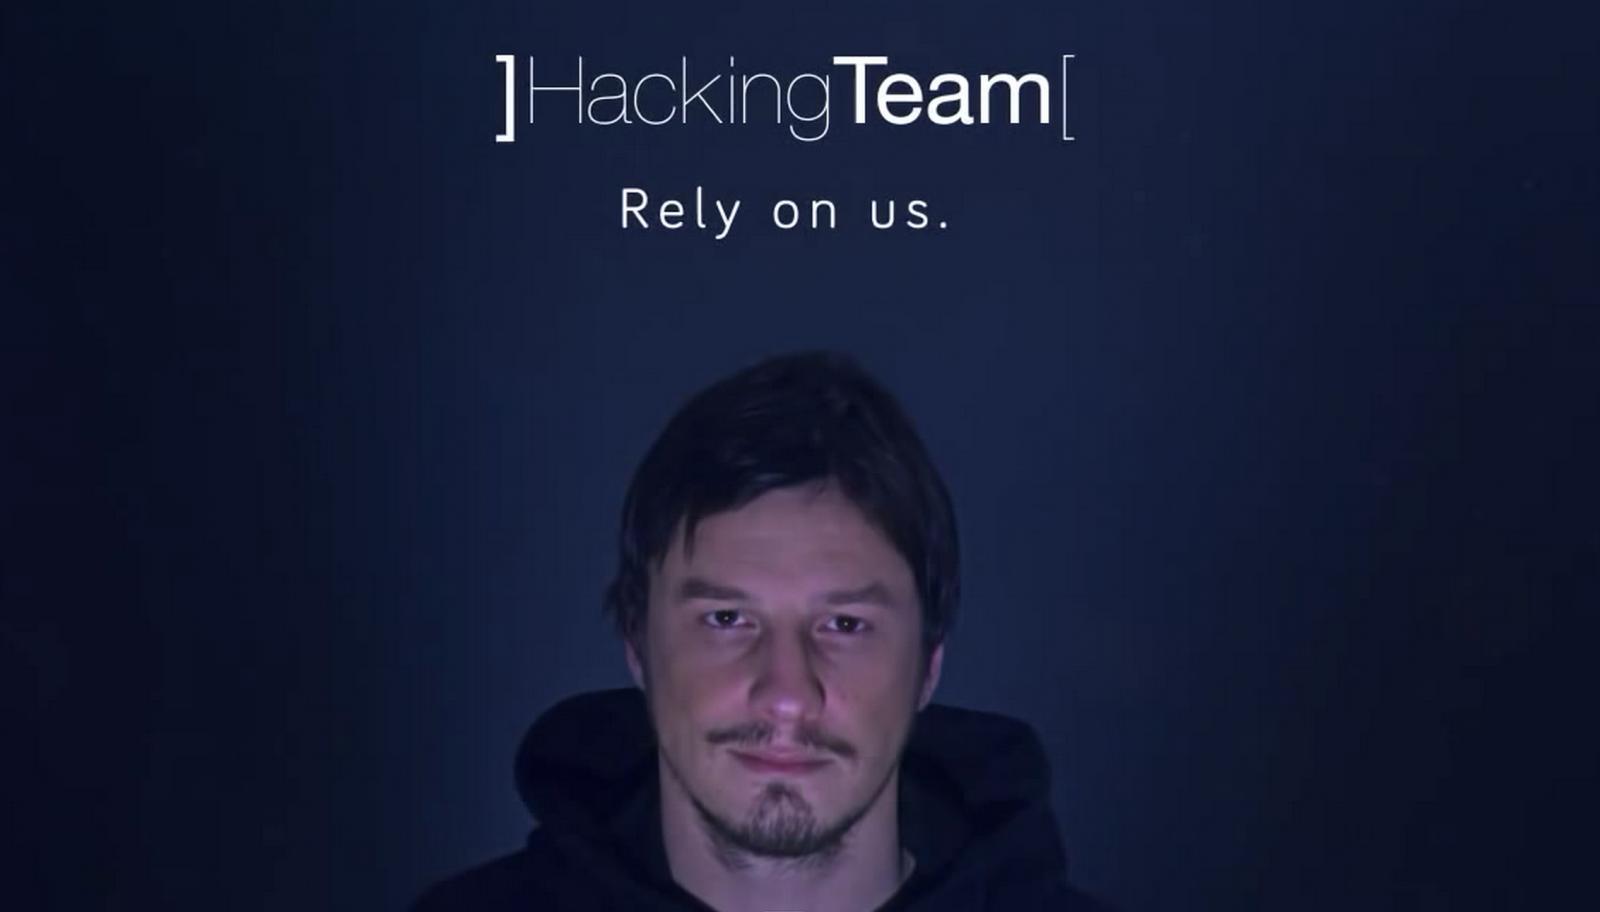 Hacking Team malware in Exploit Kits